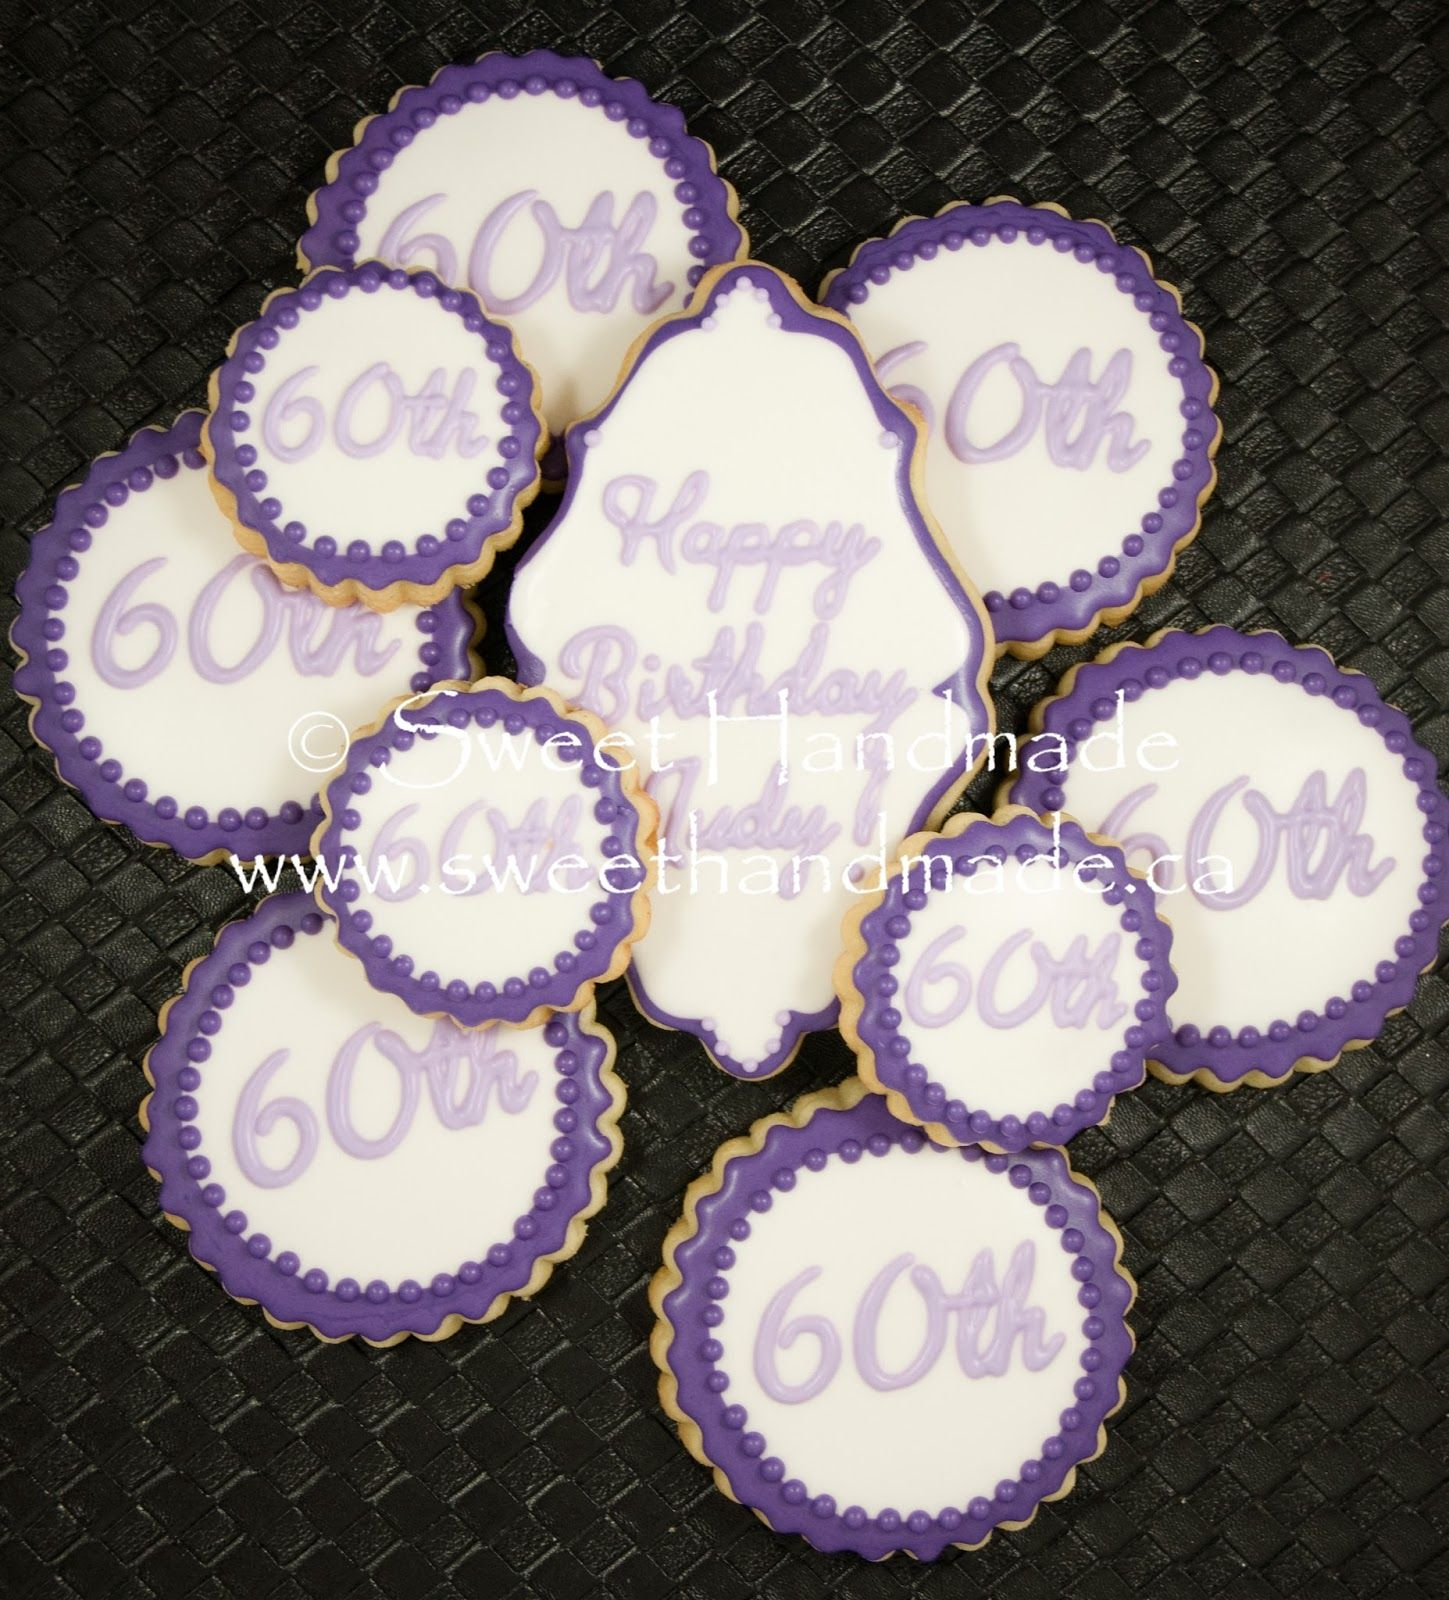 60th Birthday Celebration Cookies